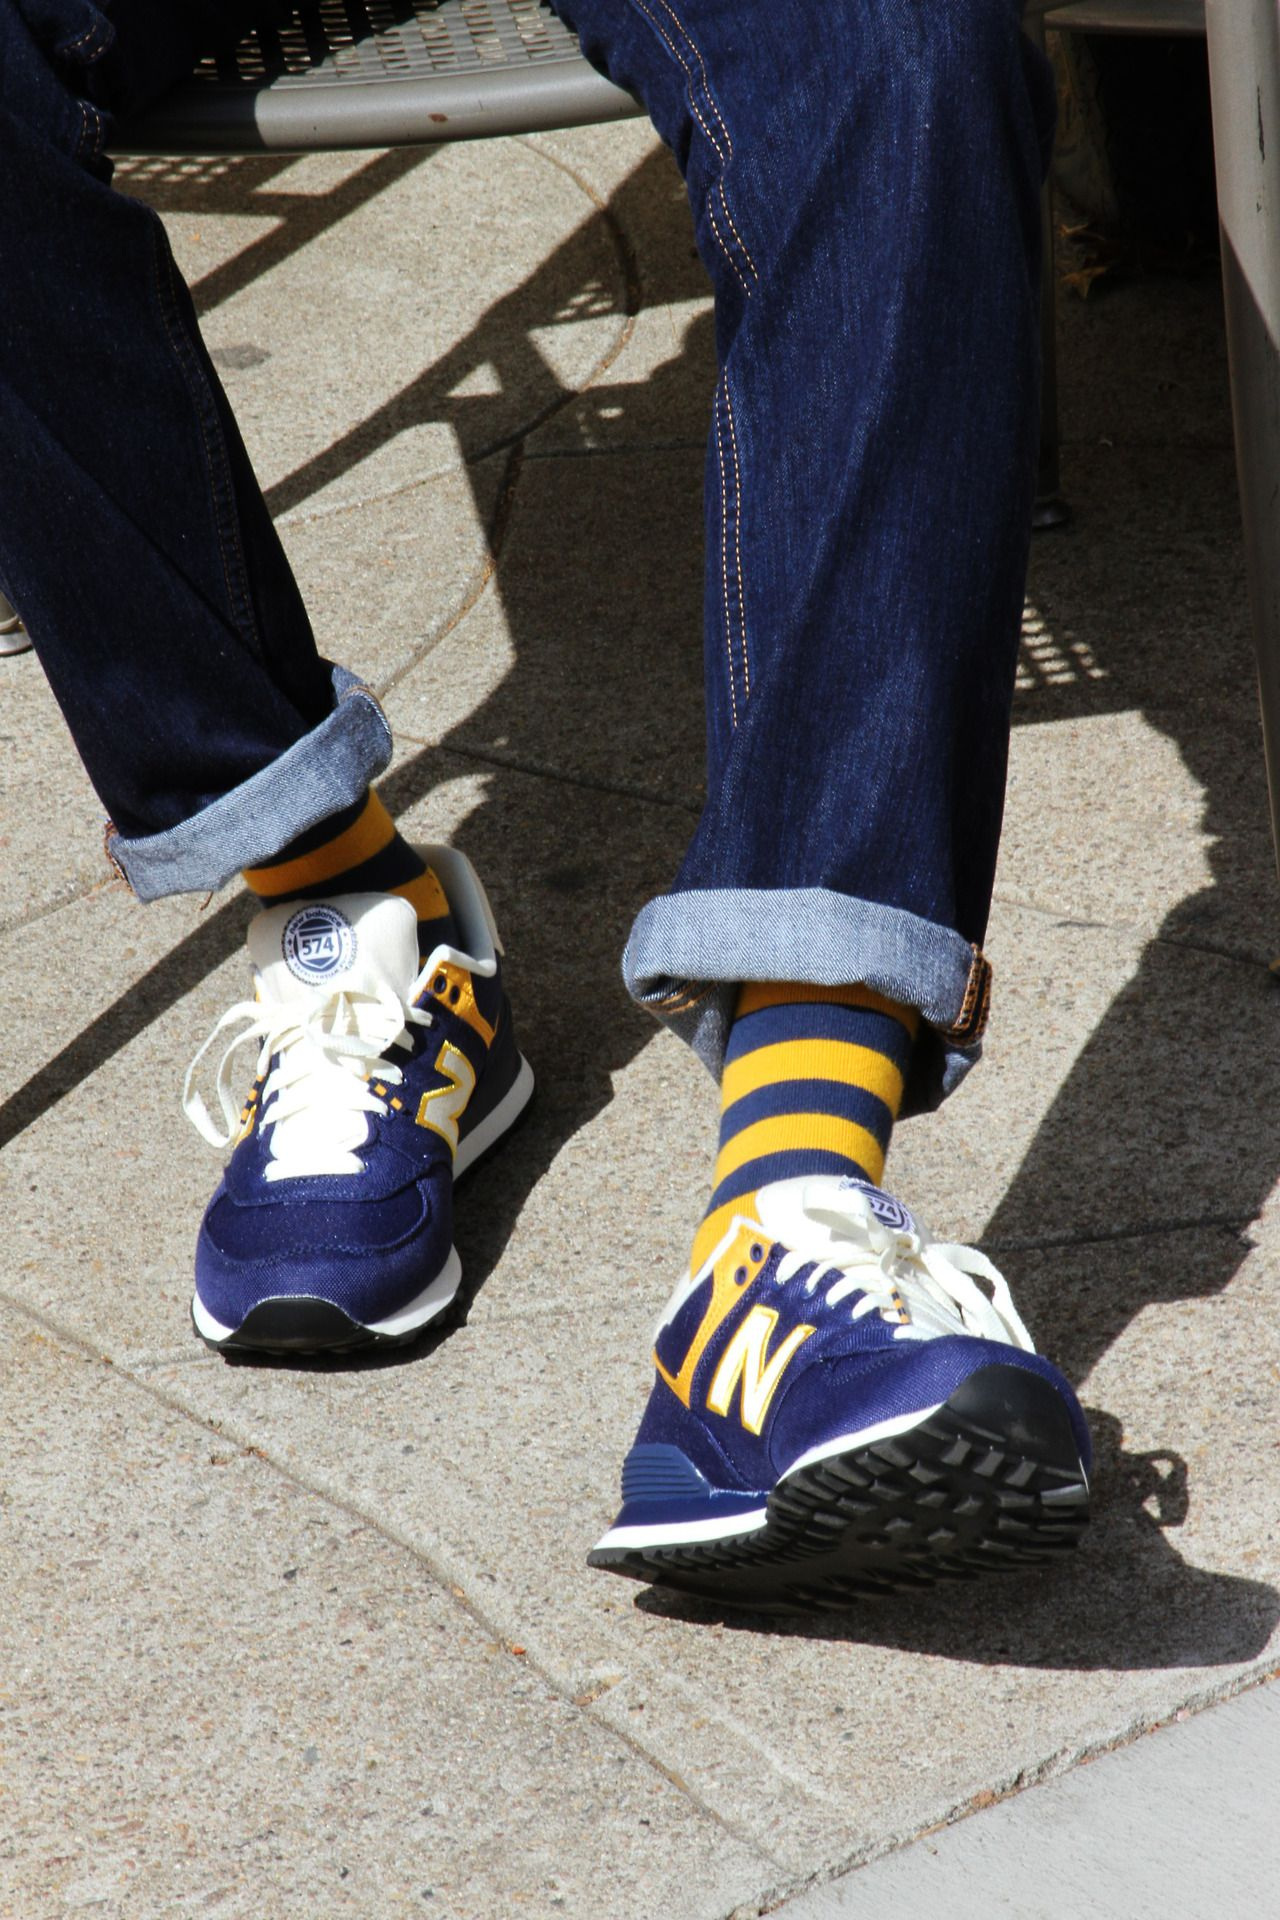 New Balance 574 Rugby Follow Gtribune.com | Mens new balance 574 ...